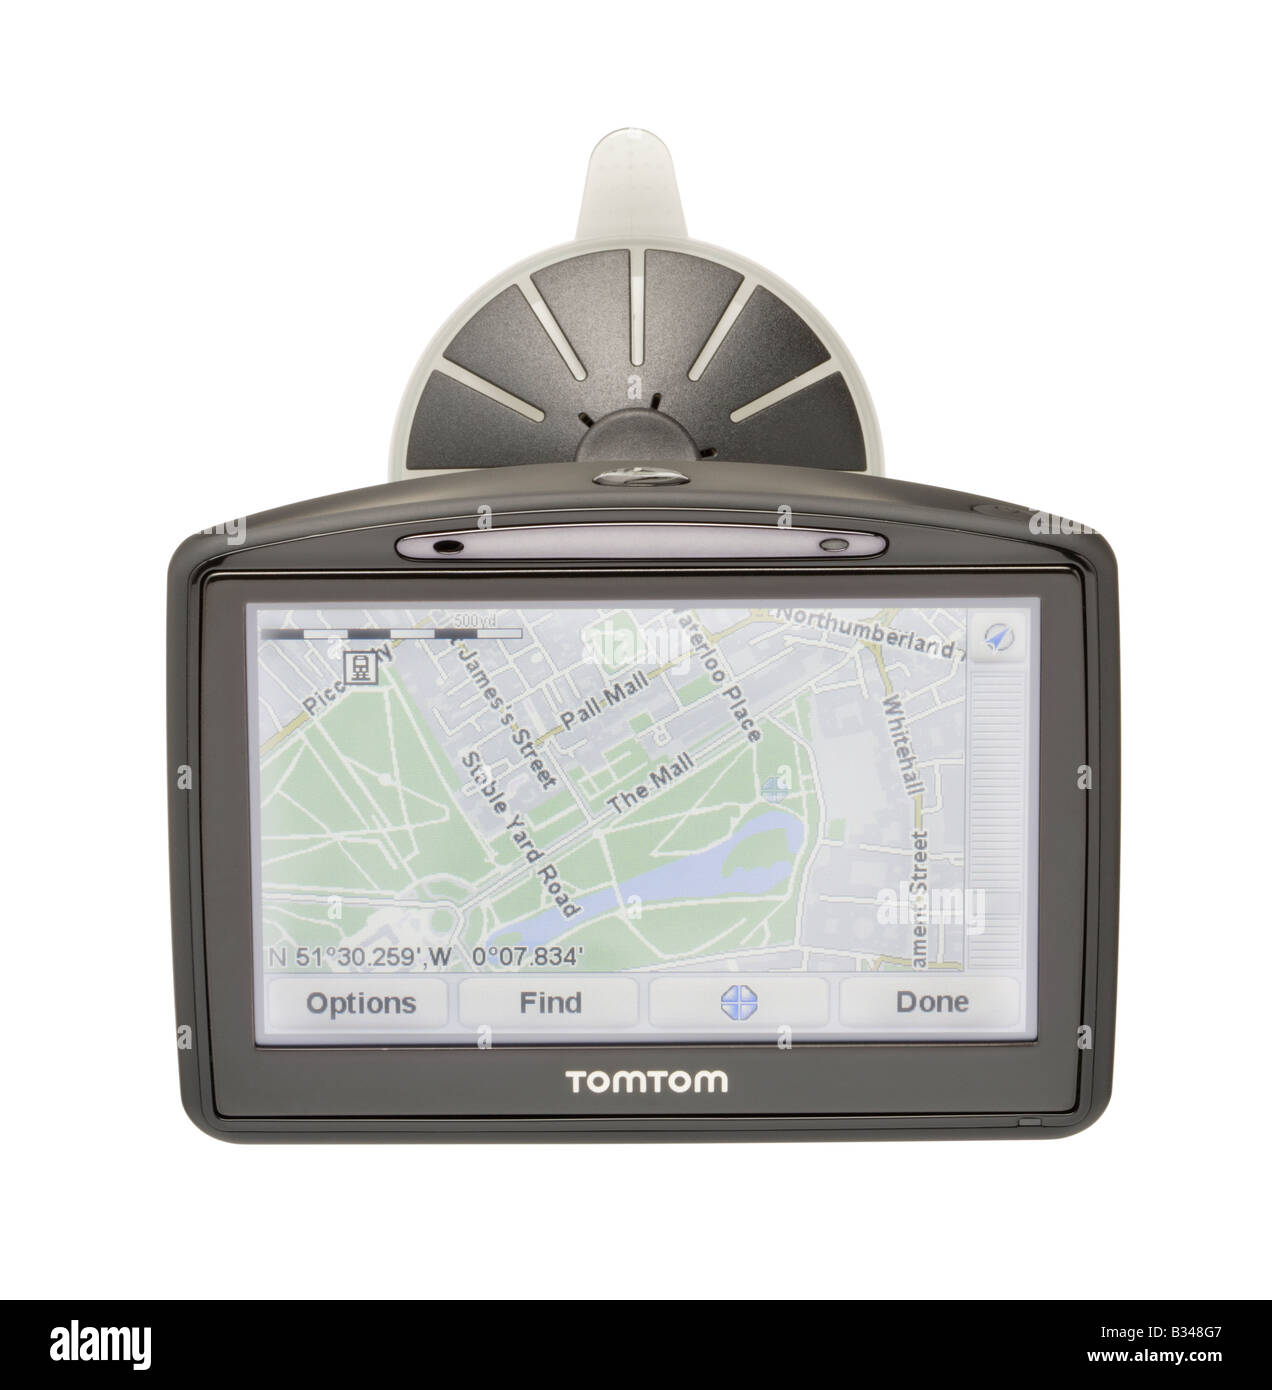 TomTom satellite navigation aid - Stock Image